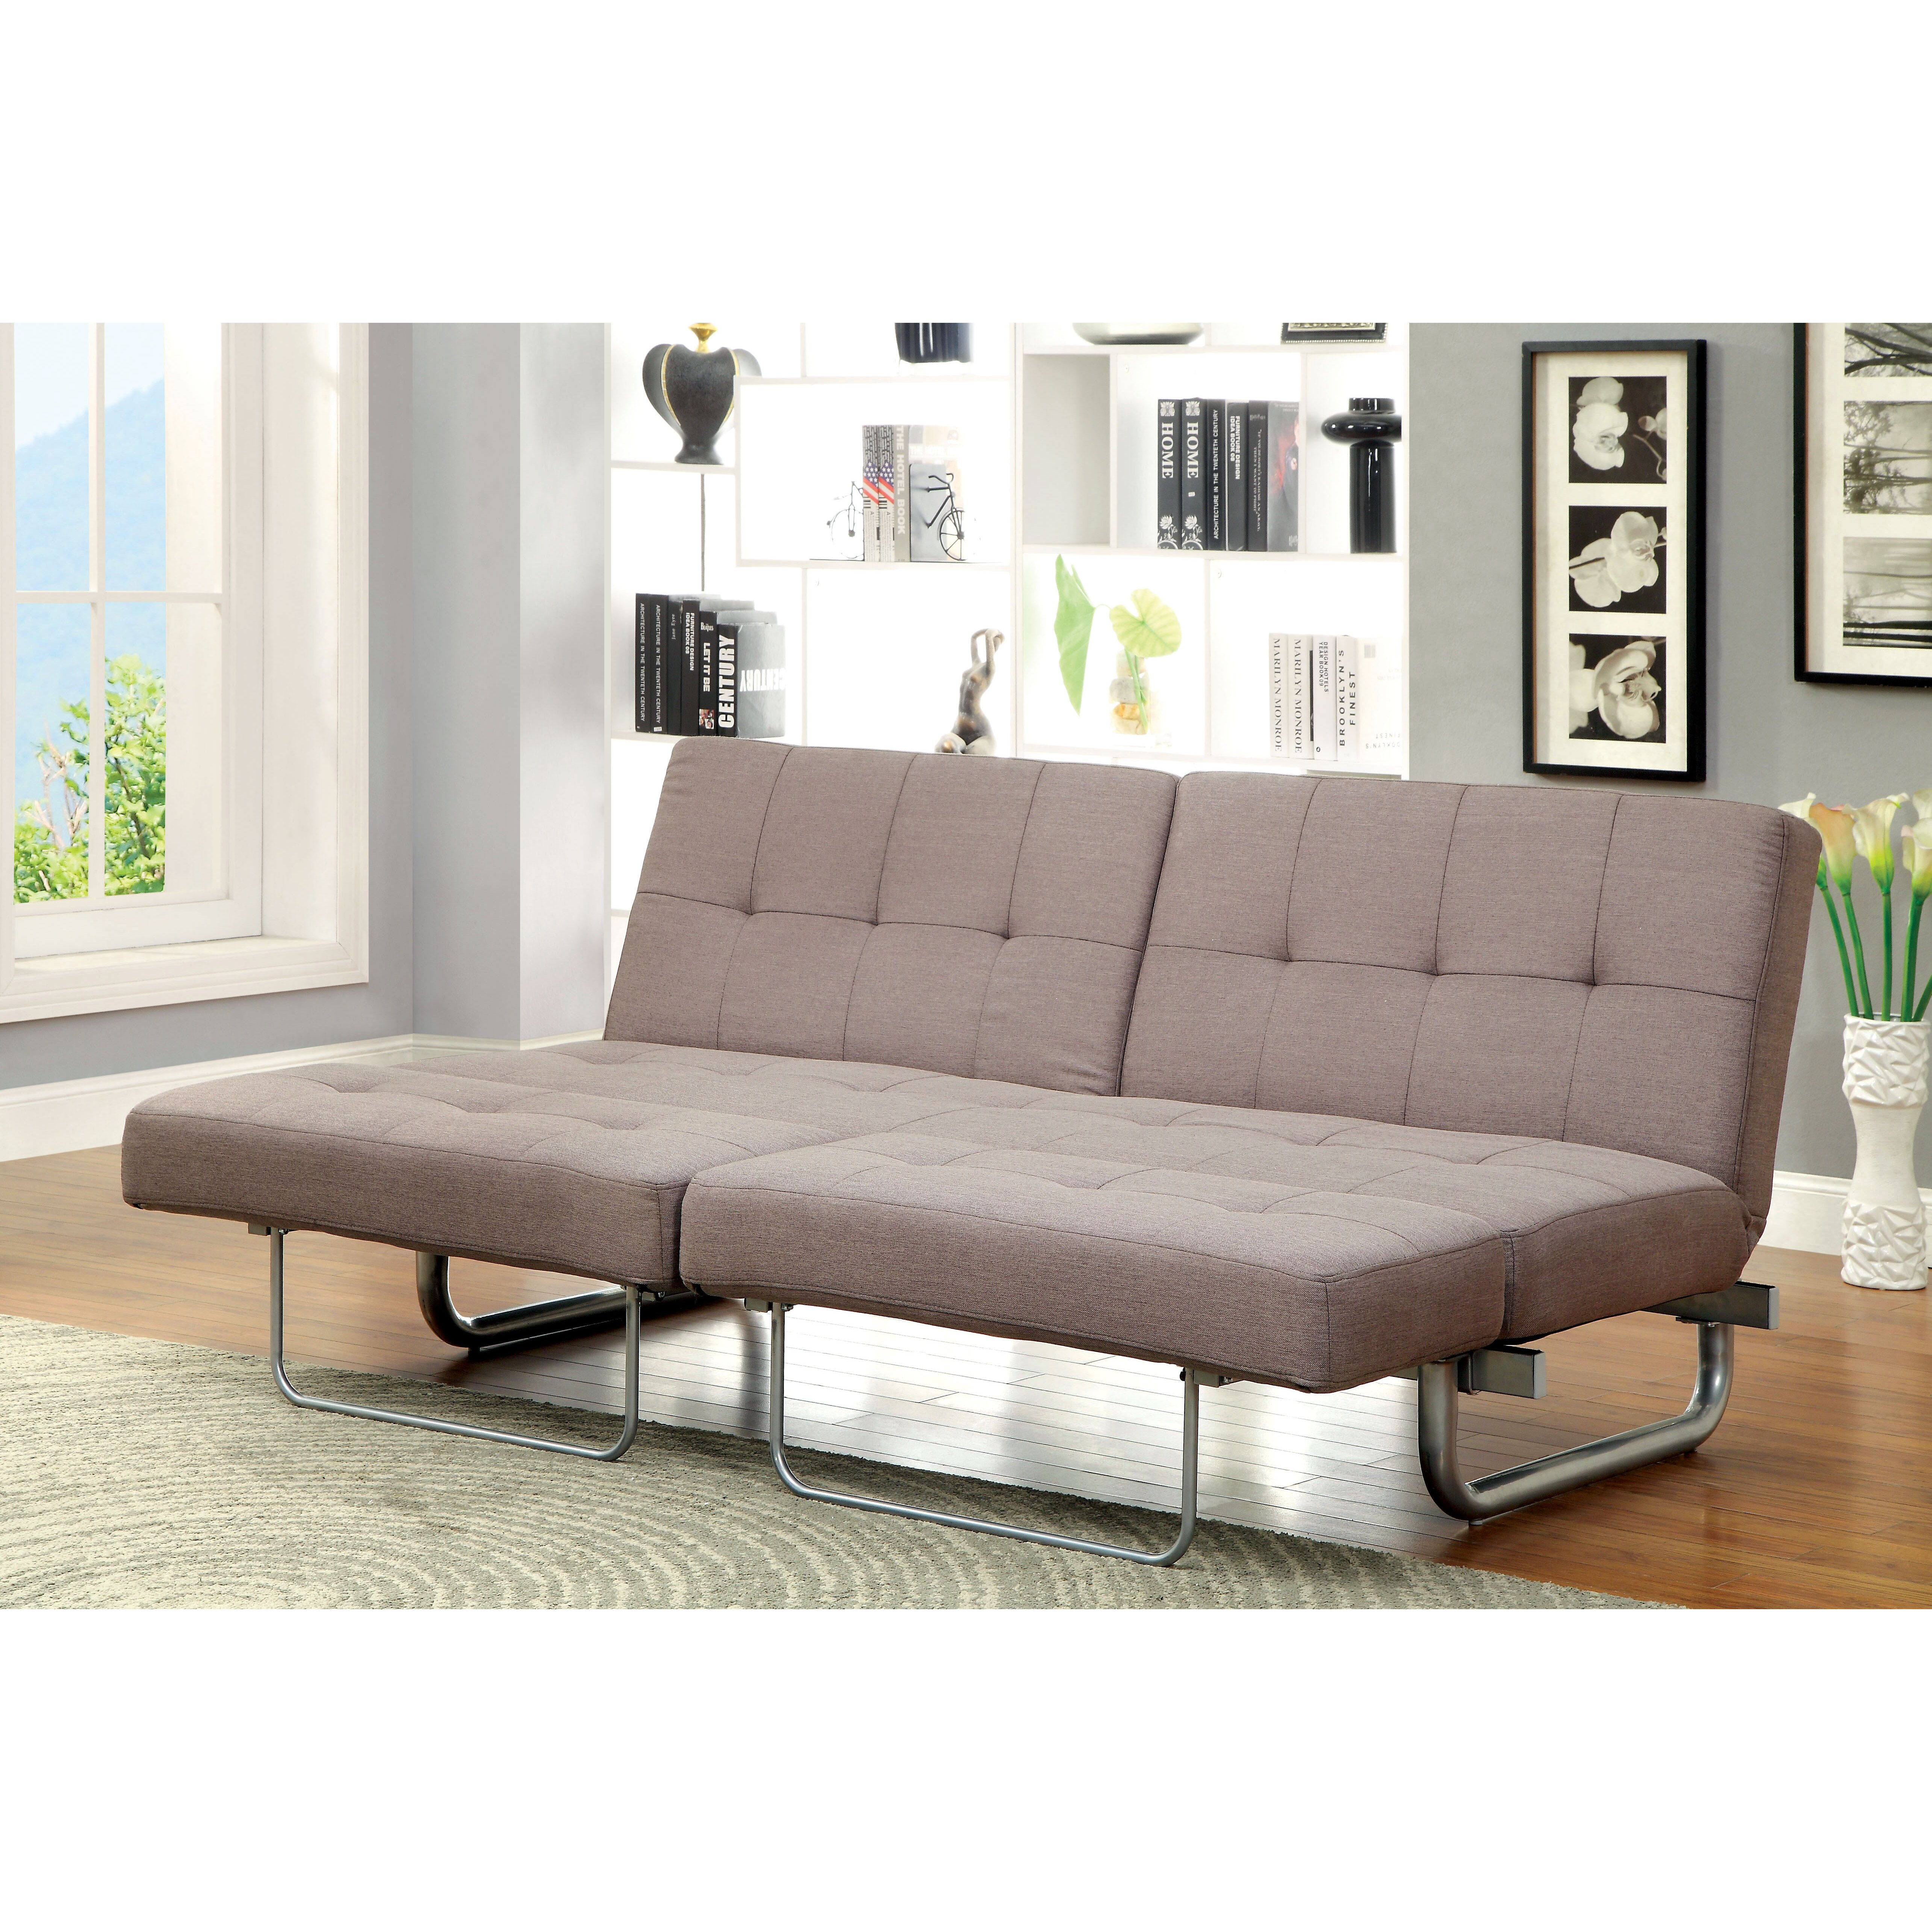 Hokku designs gardner sleeper sofa wayfair for Hokku designs living room furniture